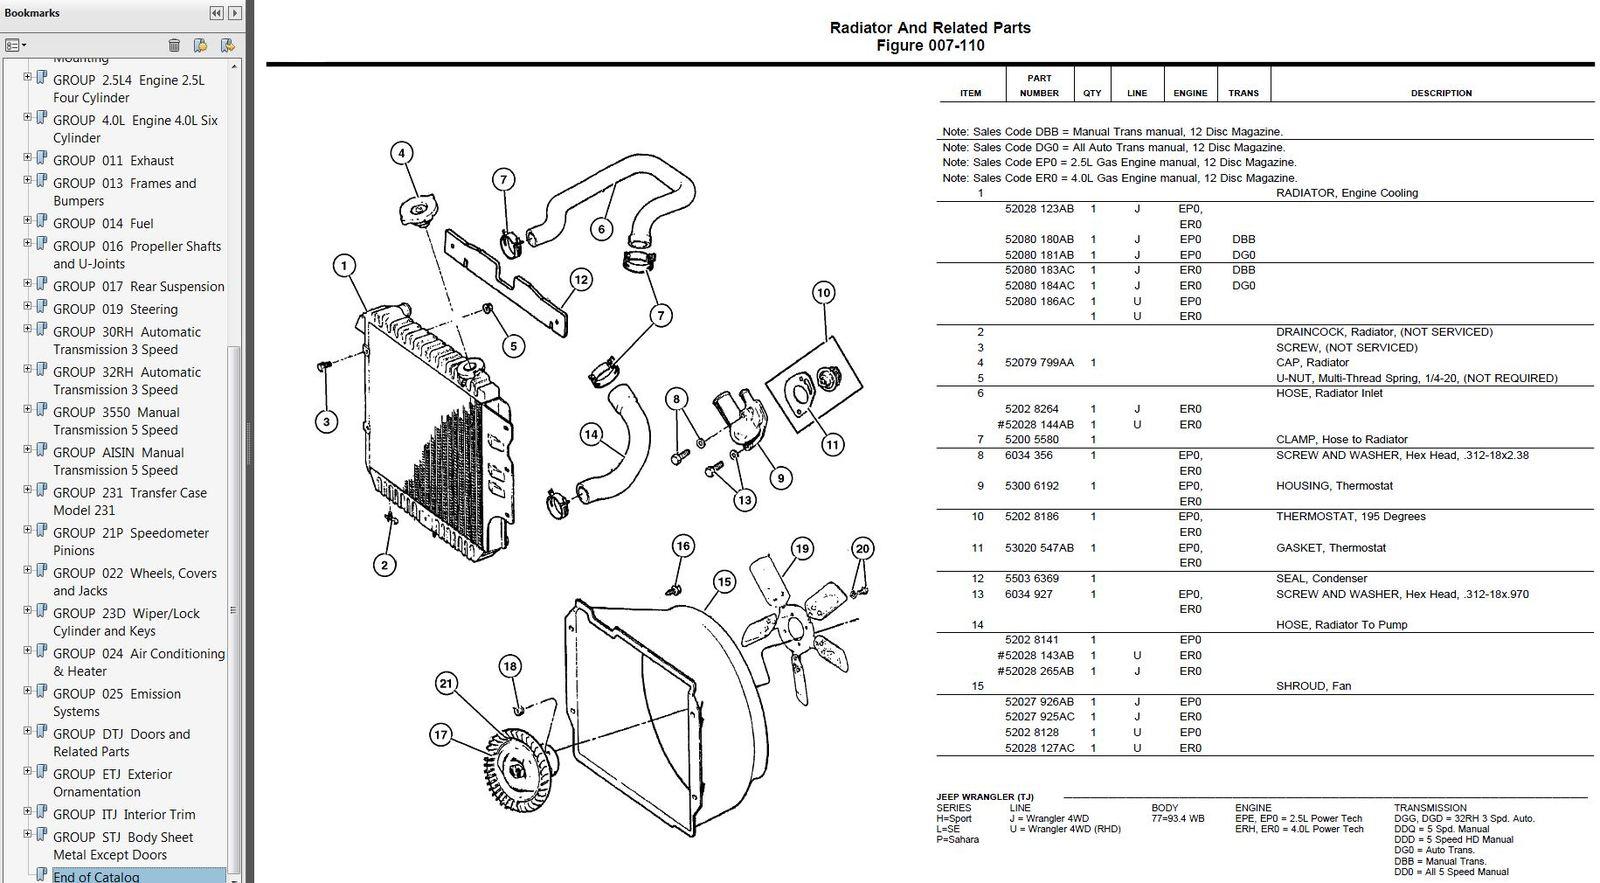 1997 1998 1999 Jeep Wrangler TJ Factory Parts Catalog